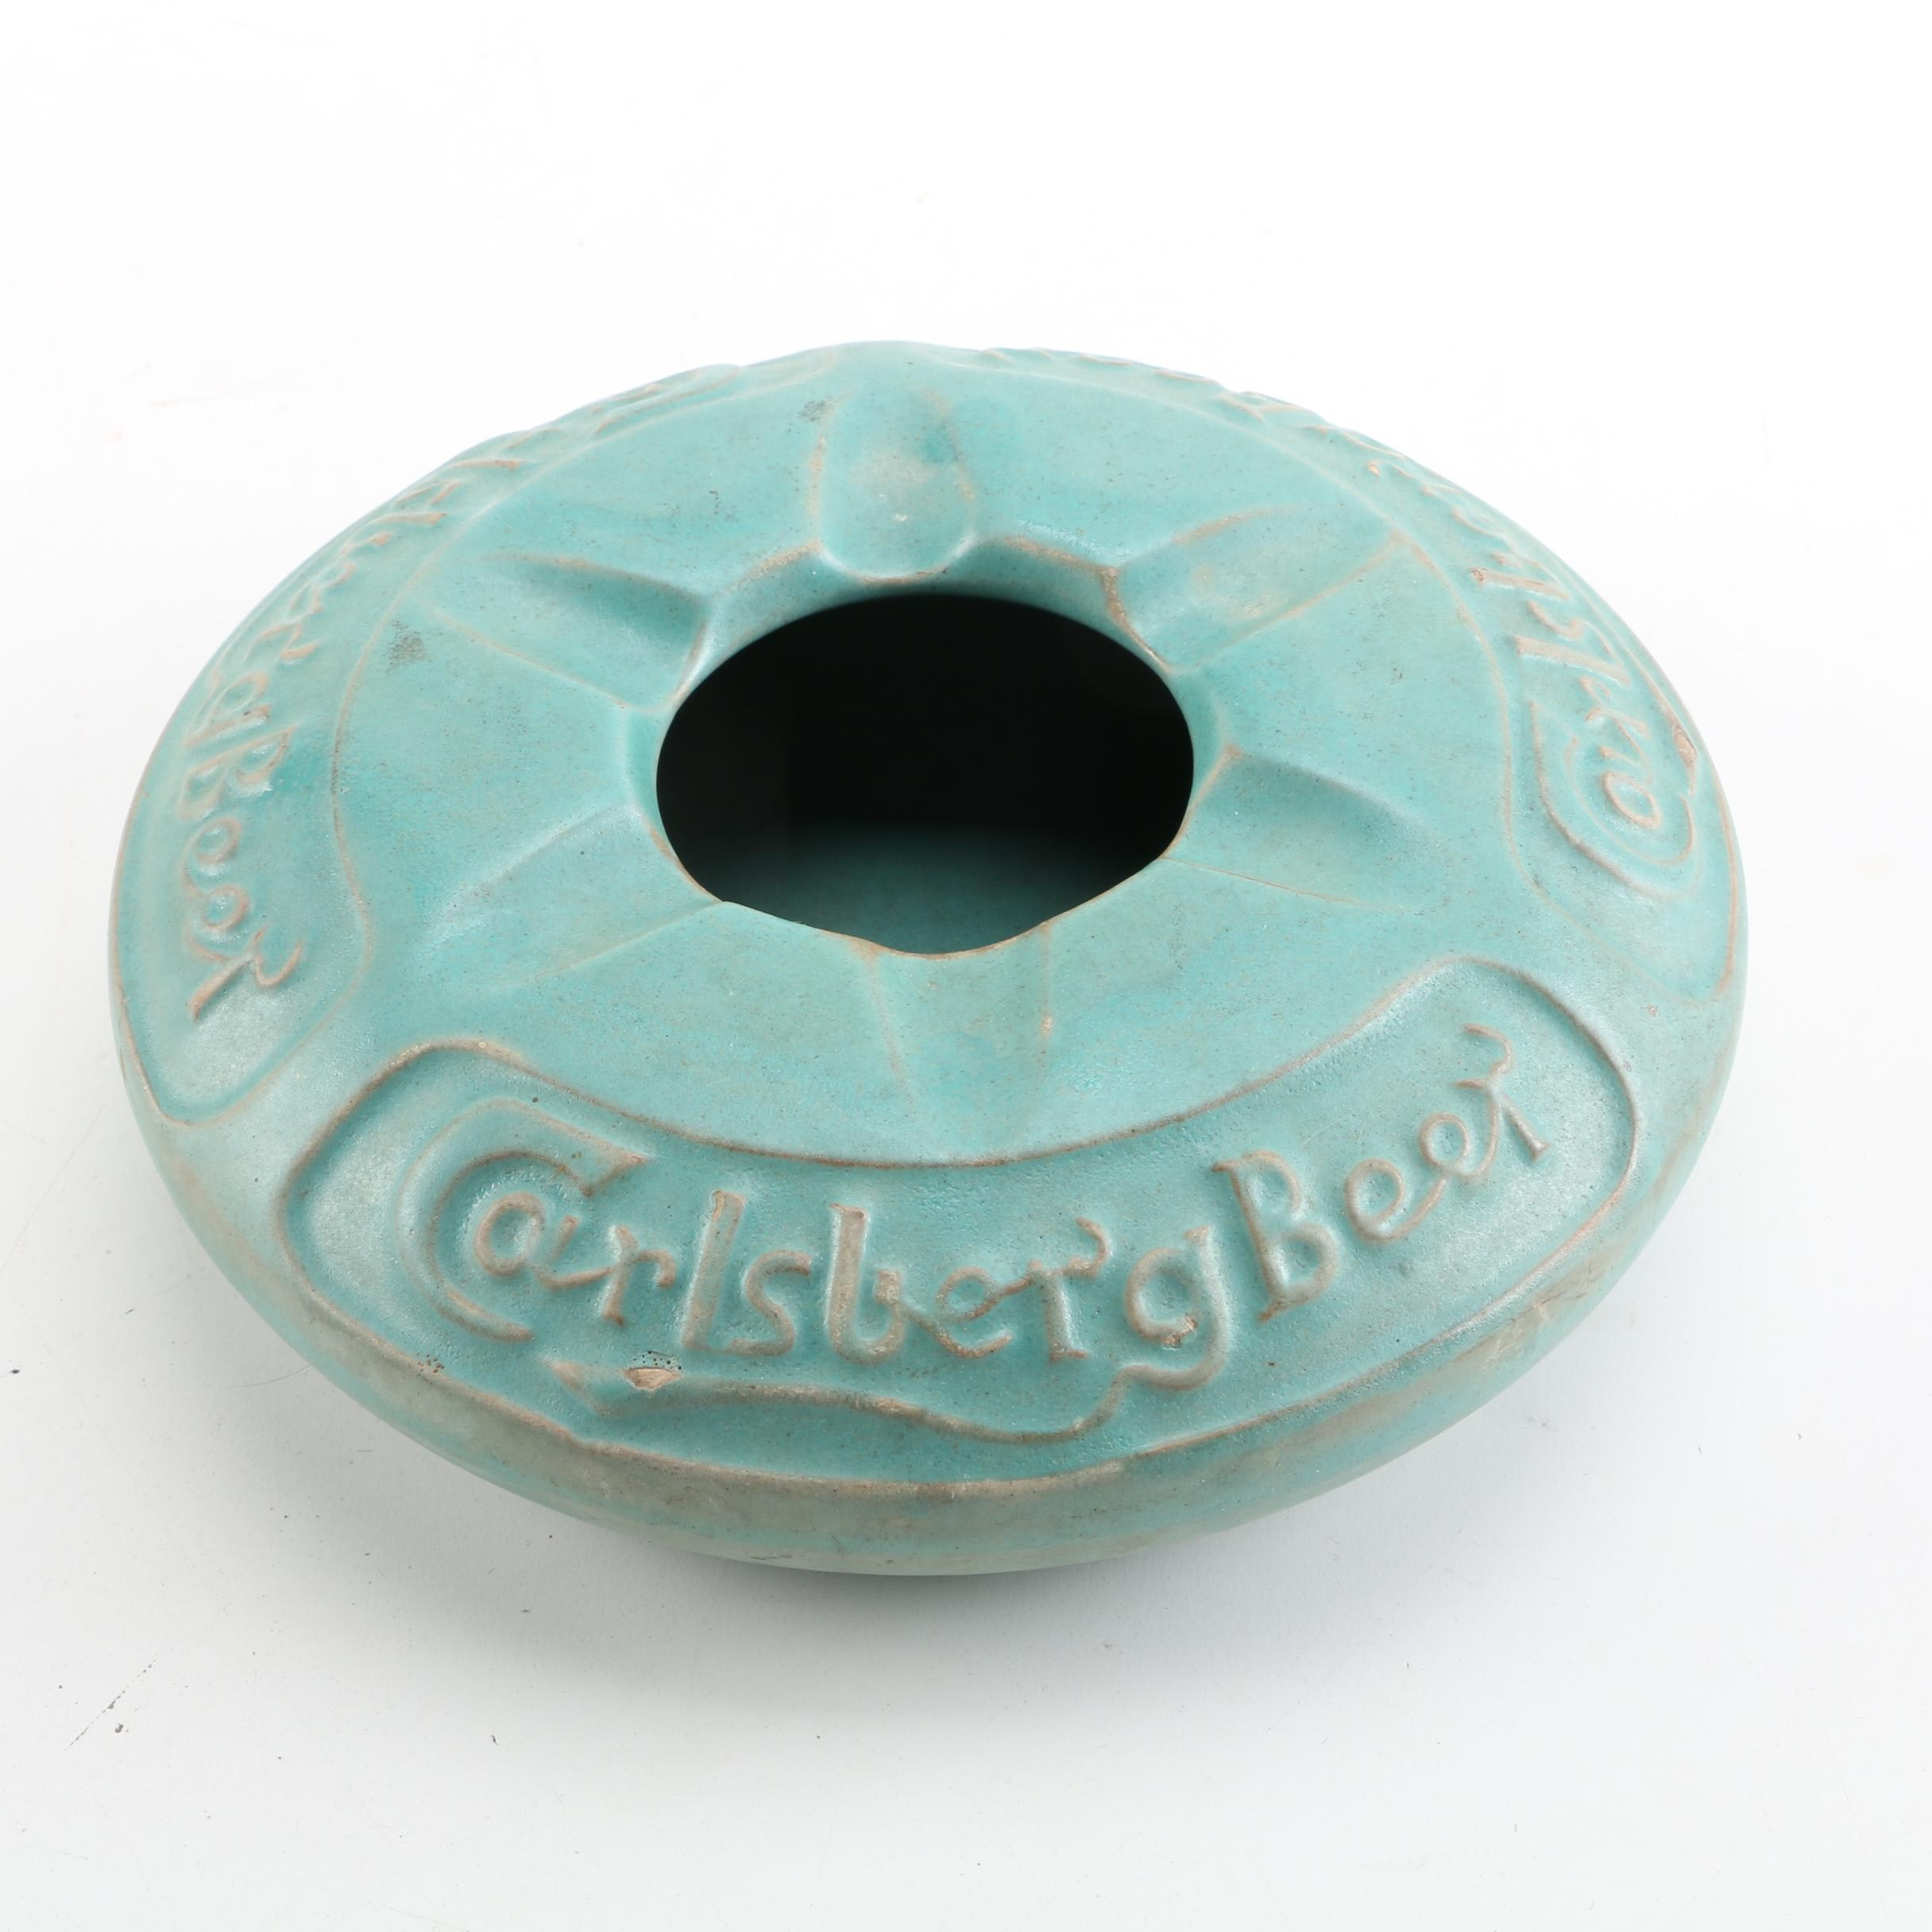 Carlsberg Beer Eslau Denmark Pottery Ashtray